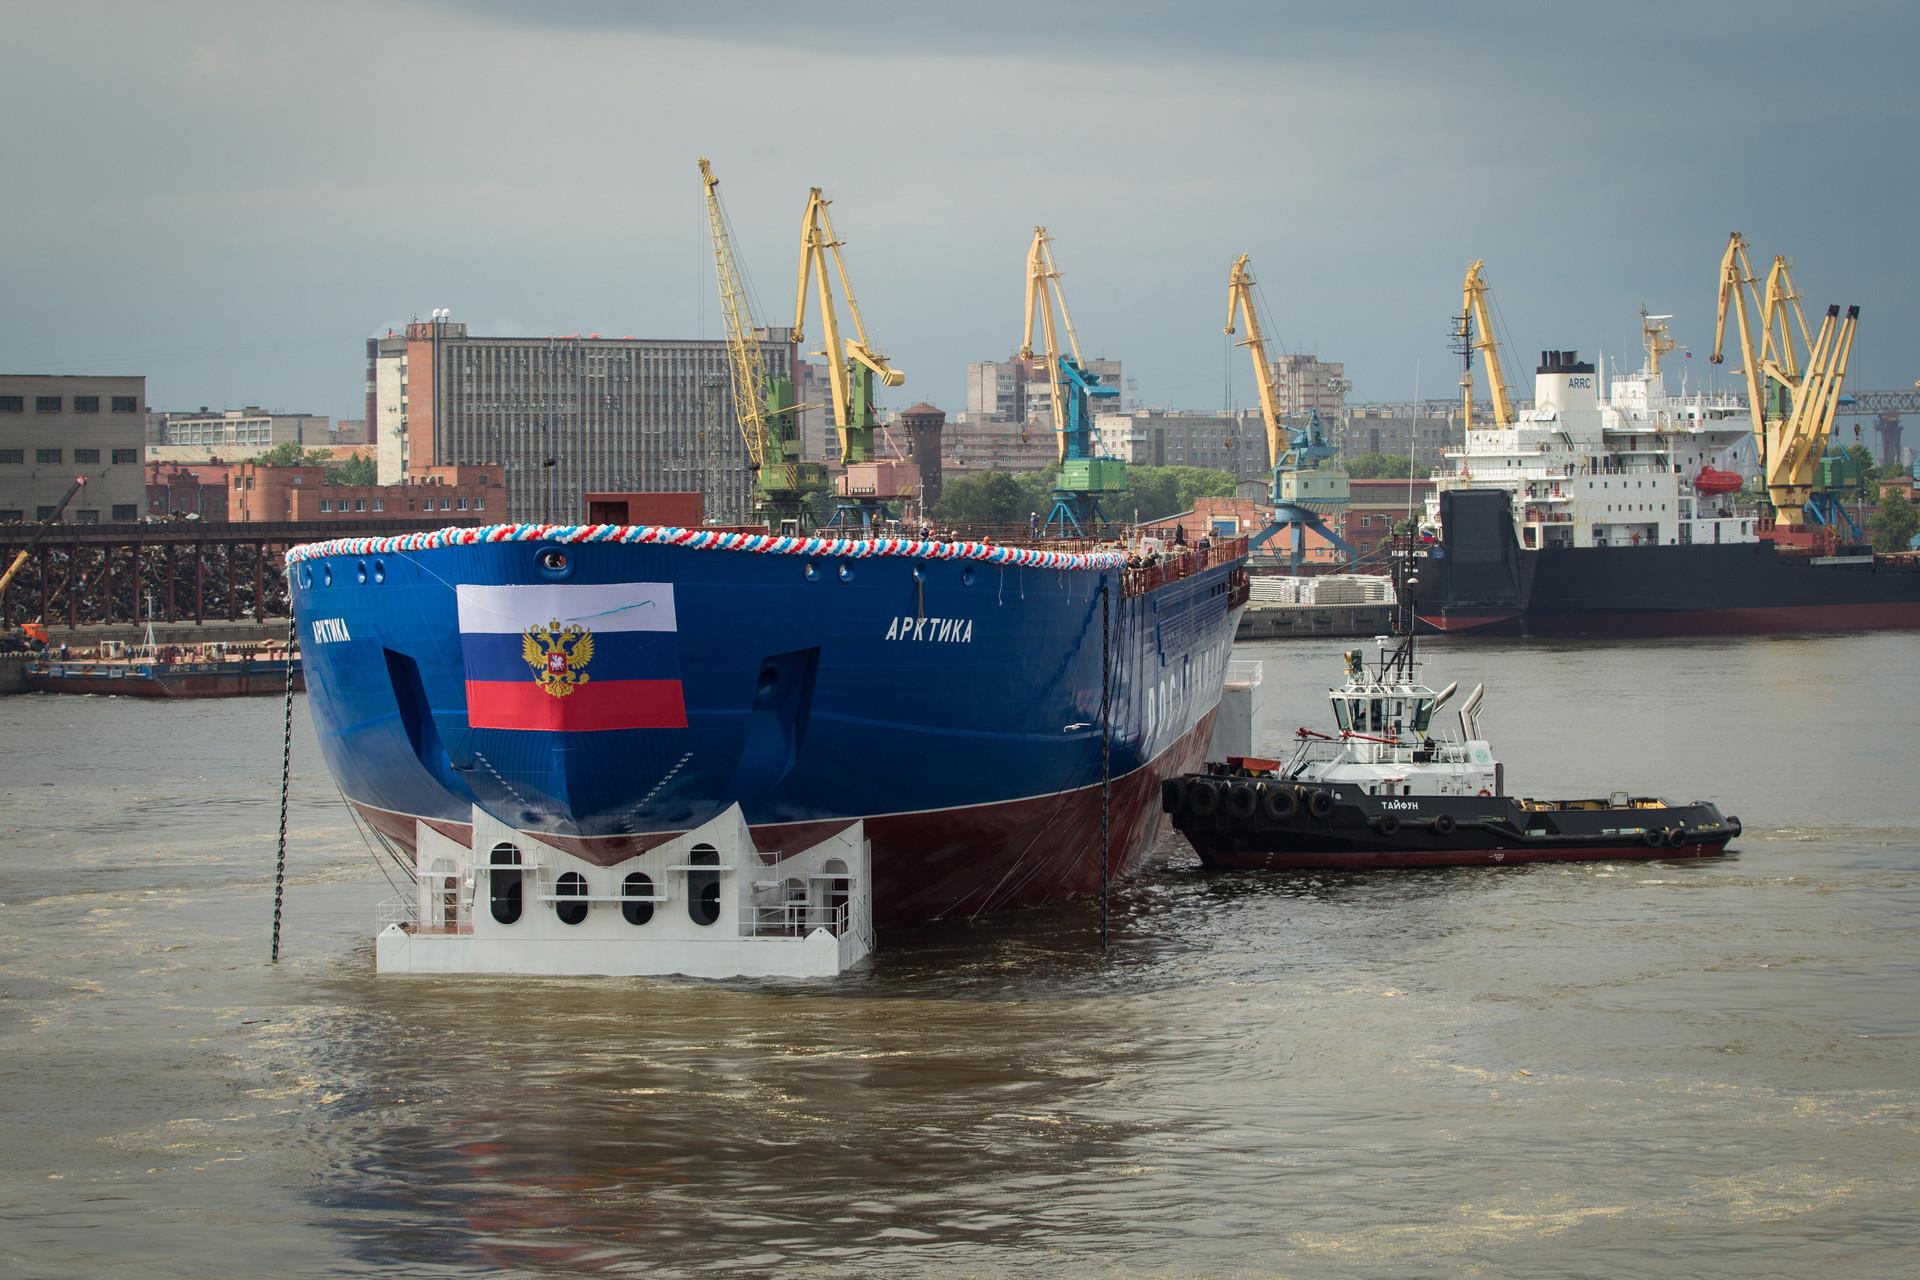 Splavitev ledolomilca Arktika, 16. 6. 2016, Baltiška ladjedelnica v St. Peterburgu